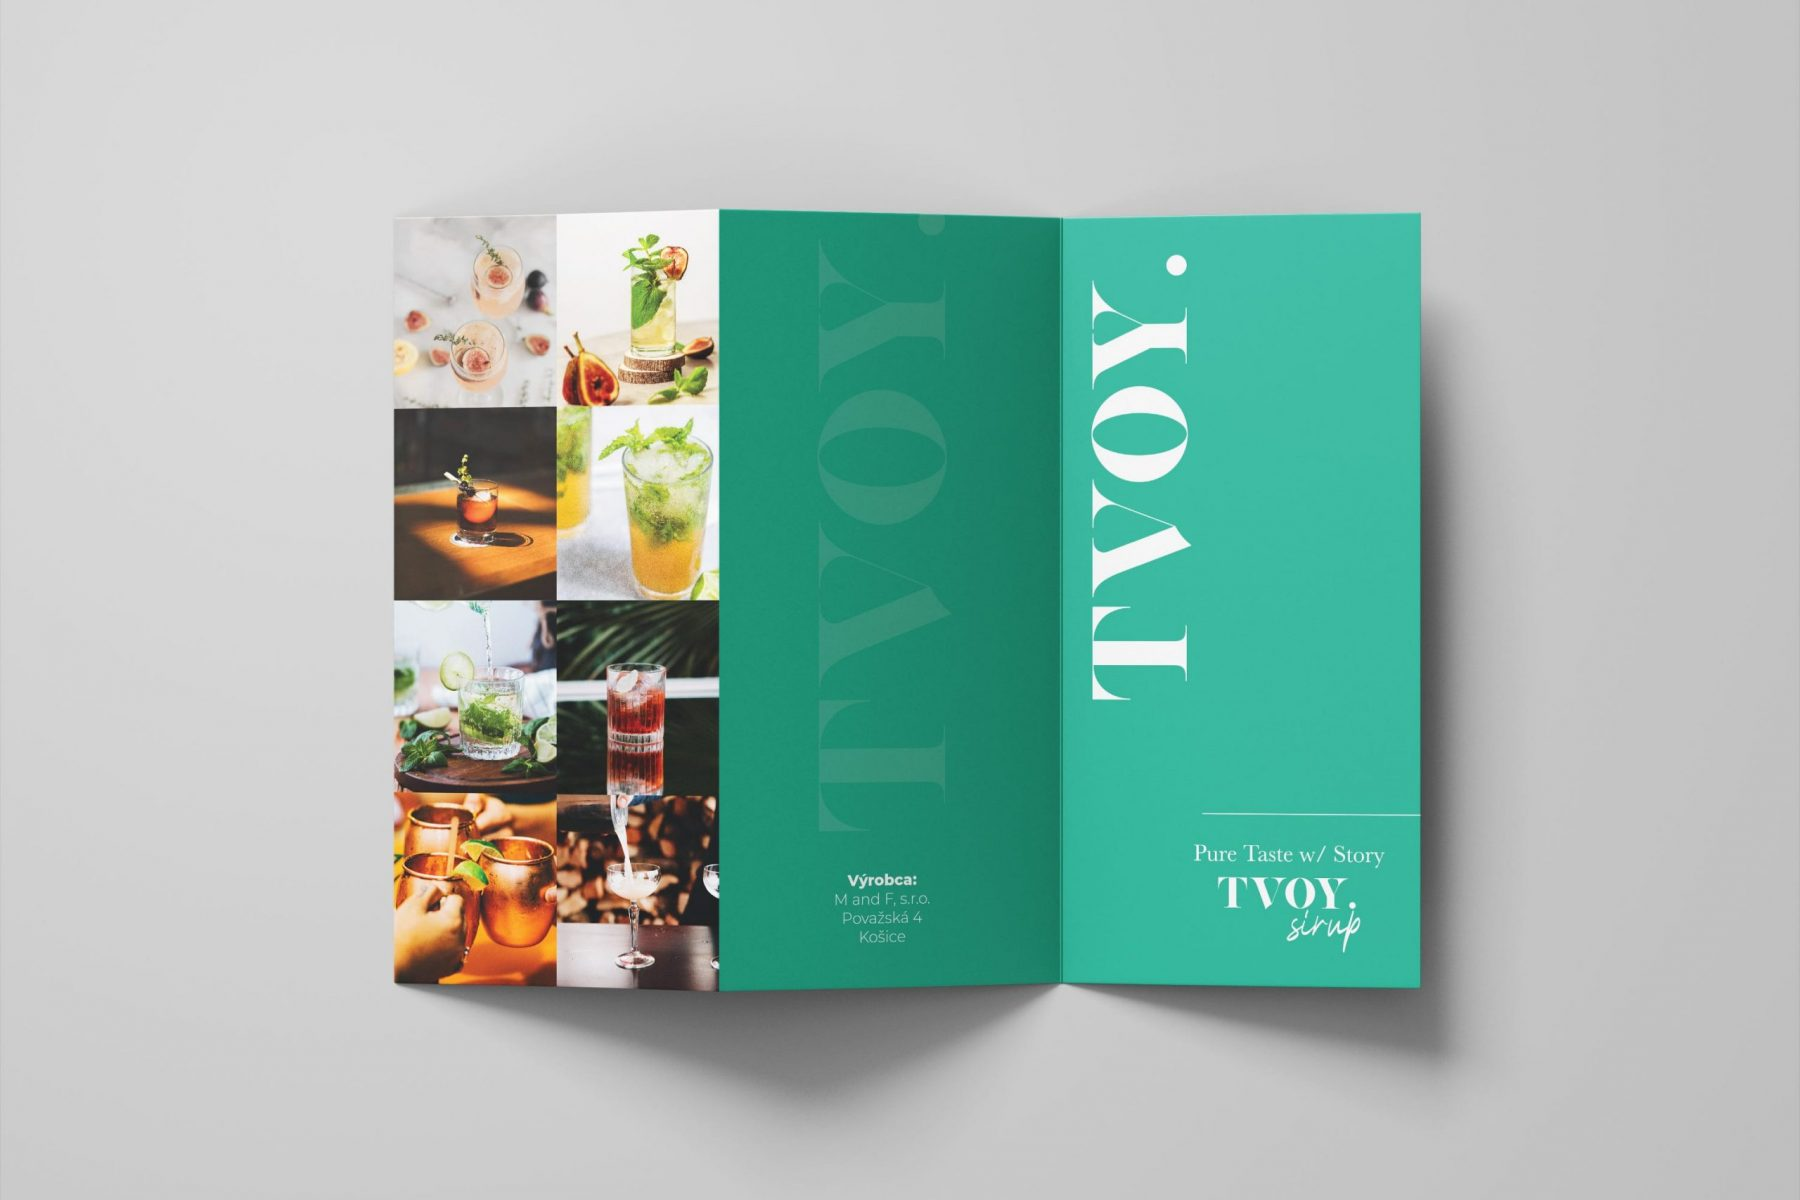 tvoy-mockup-2